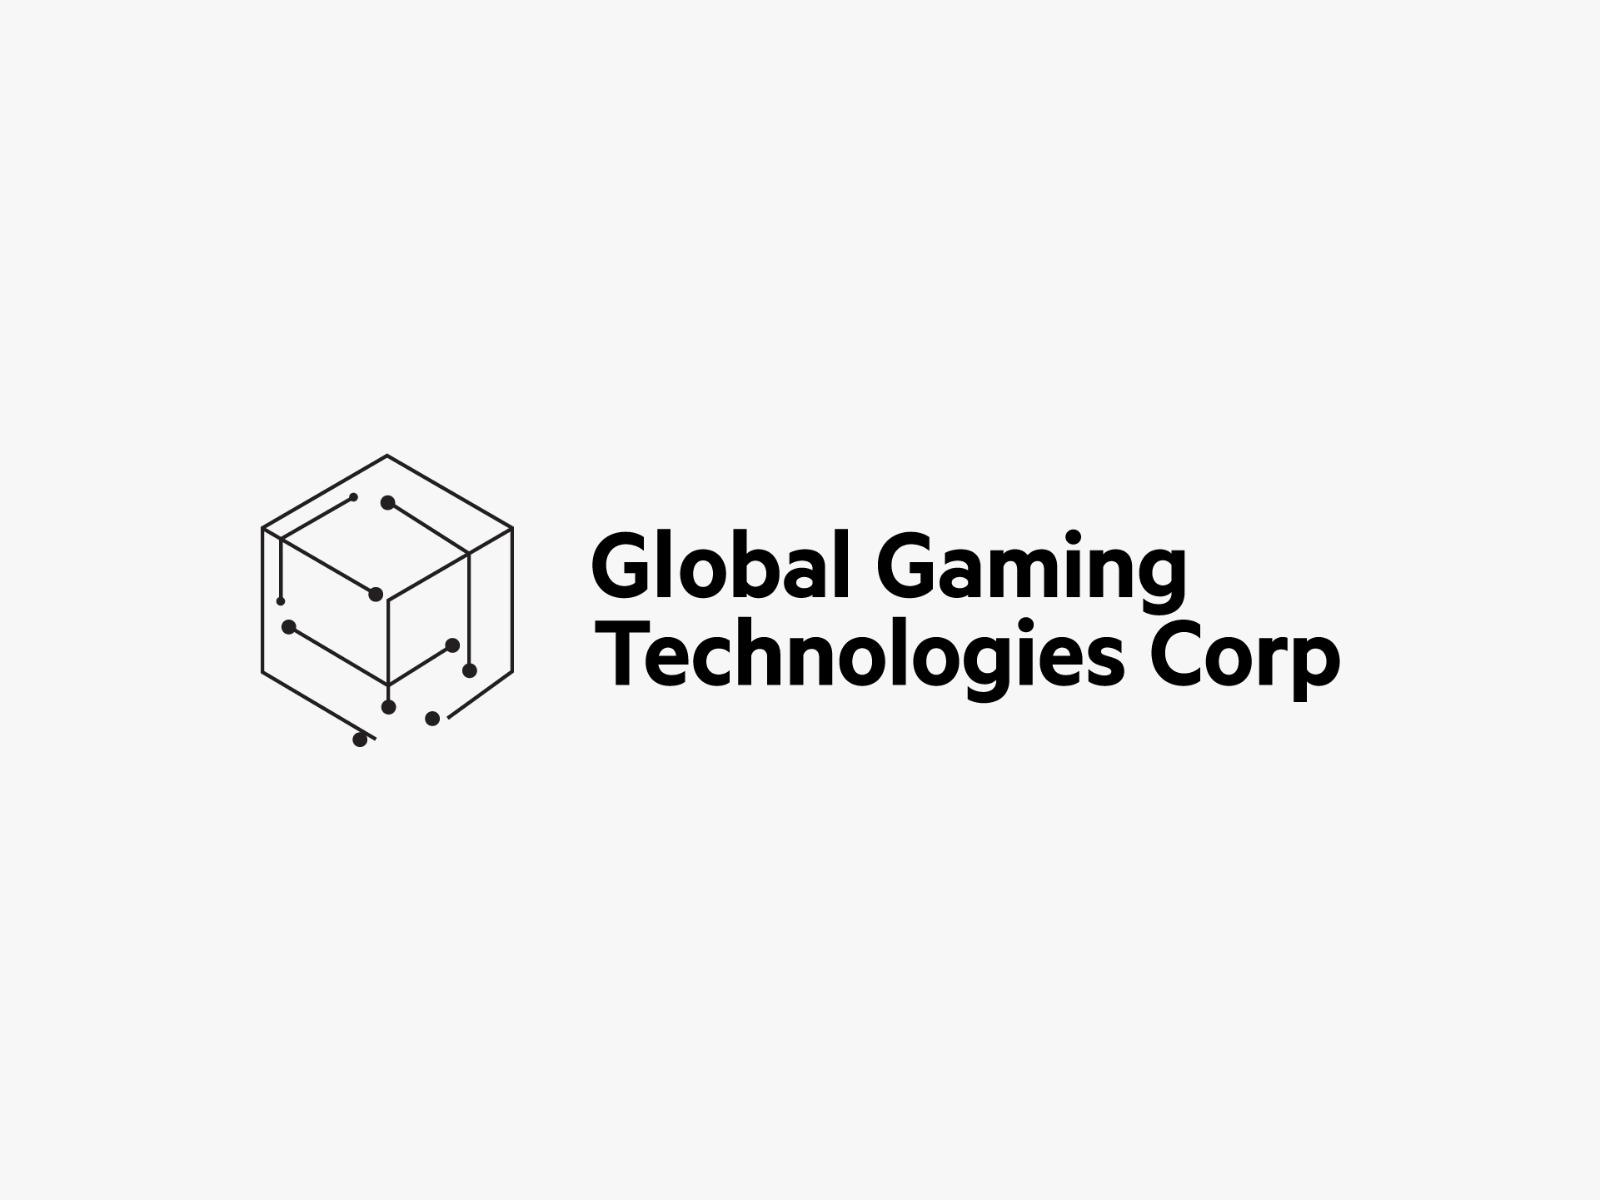 Global Gaming Technologies Corp.